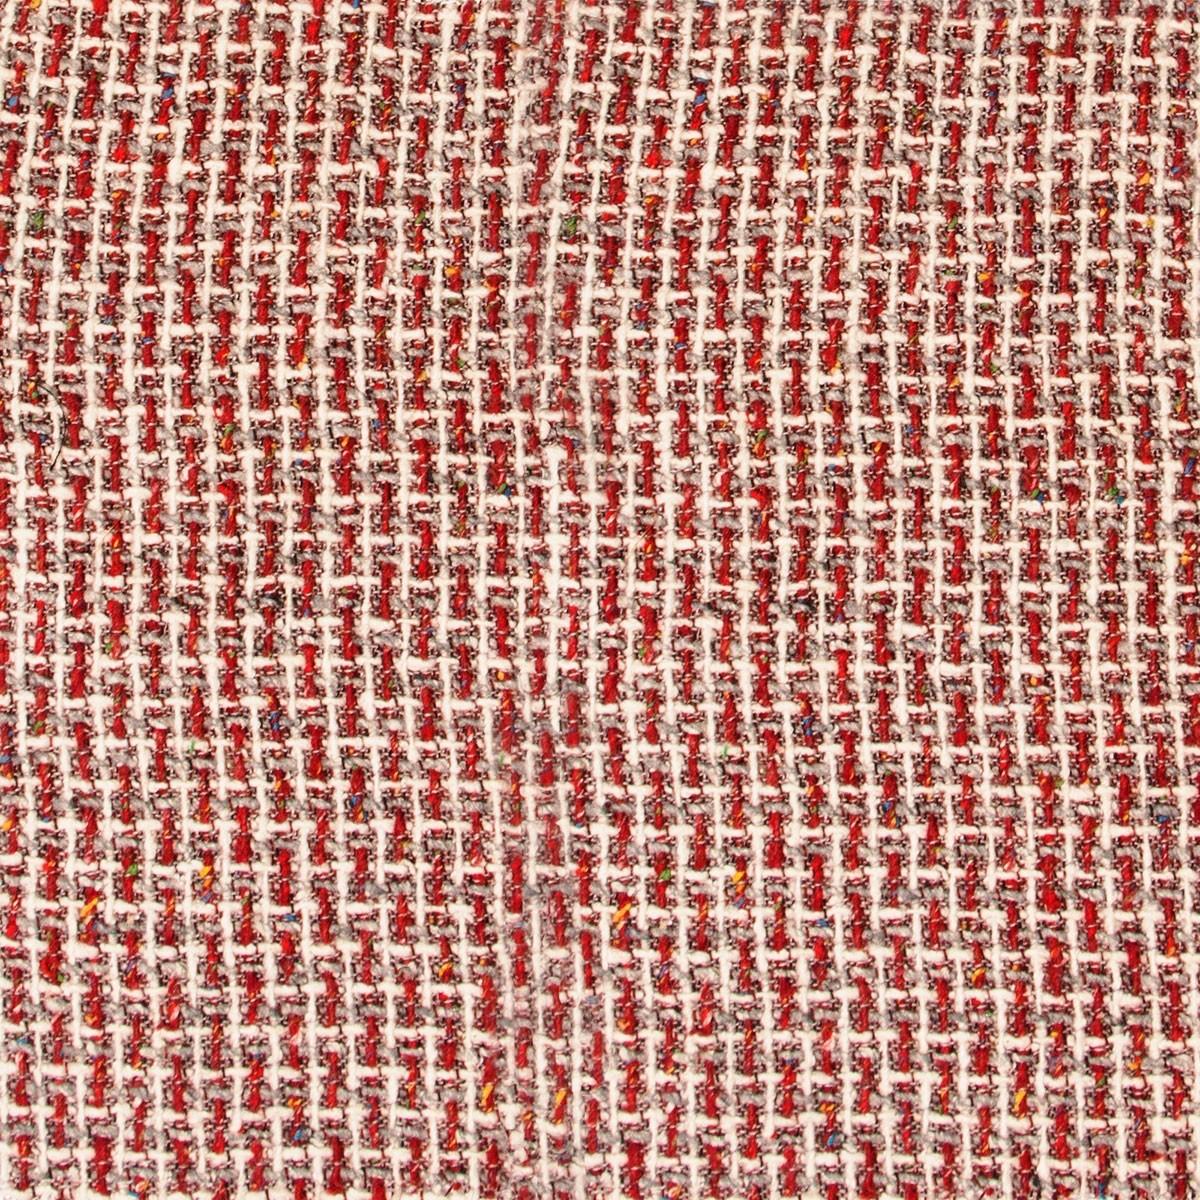 Red/White/Grey Wool Jacketing Fabric